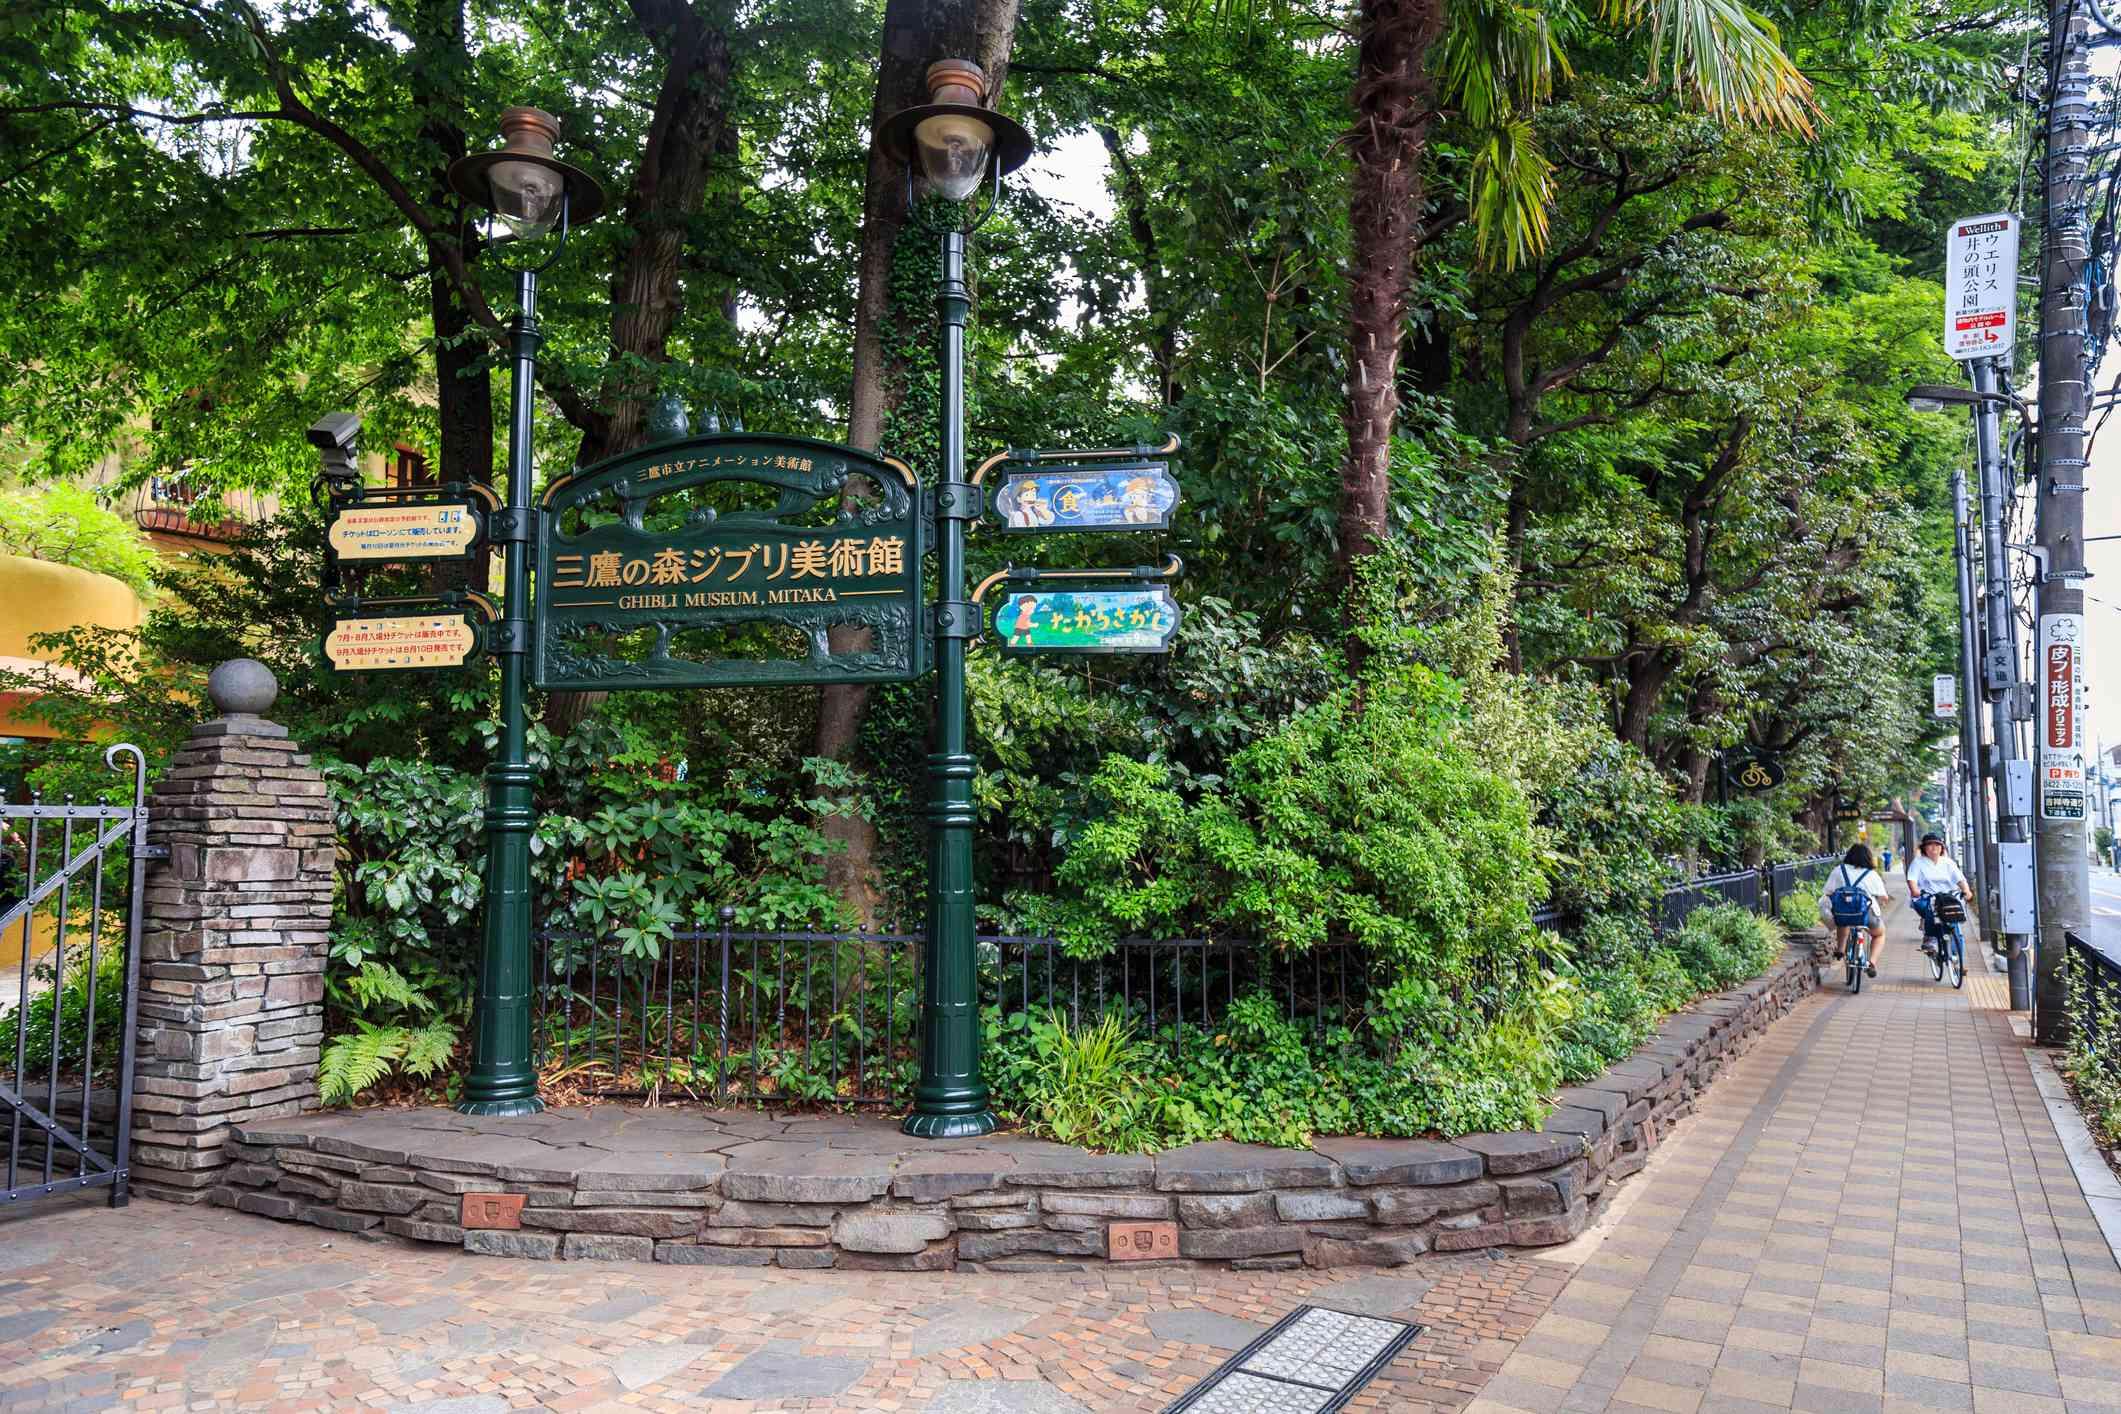 Road signs of Ghibli museum in Inokashira park, Mitaka